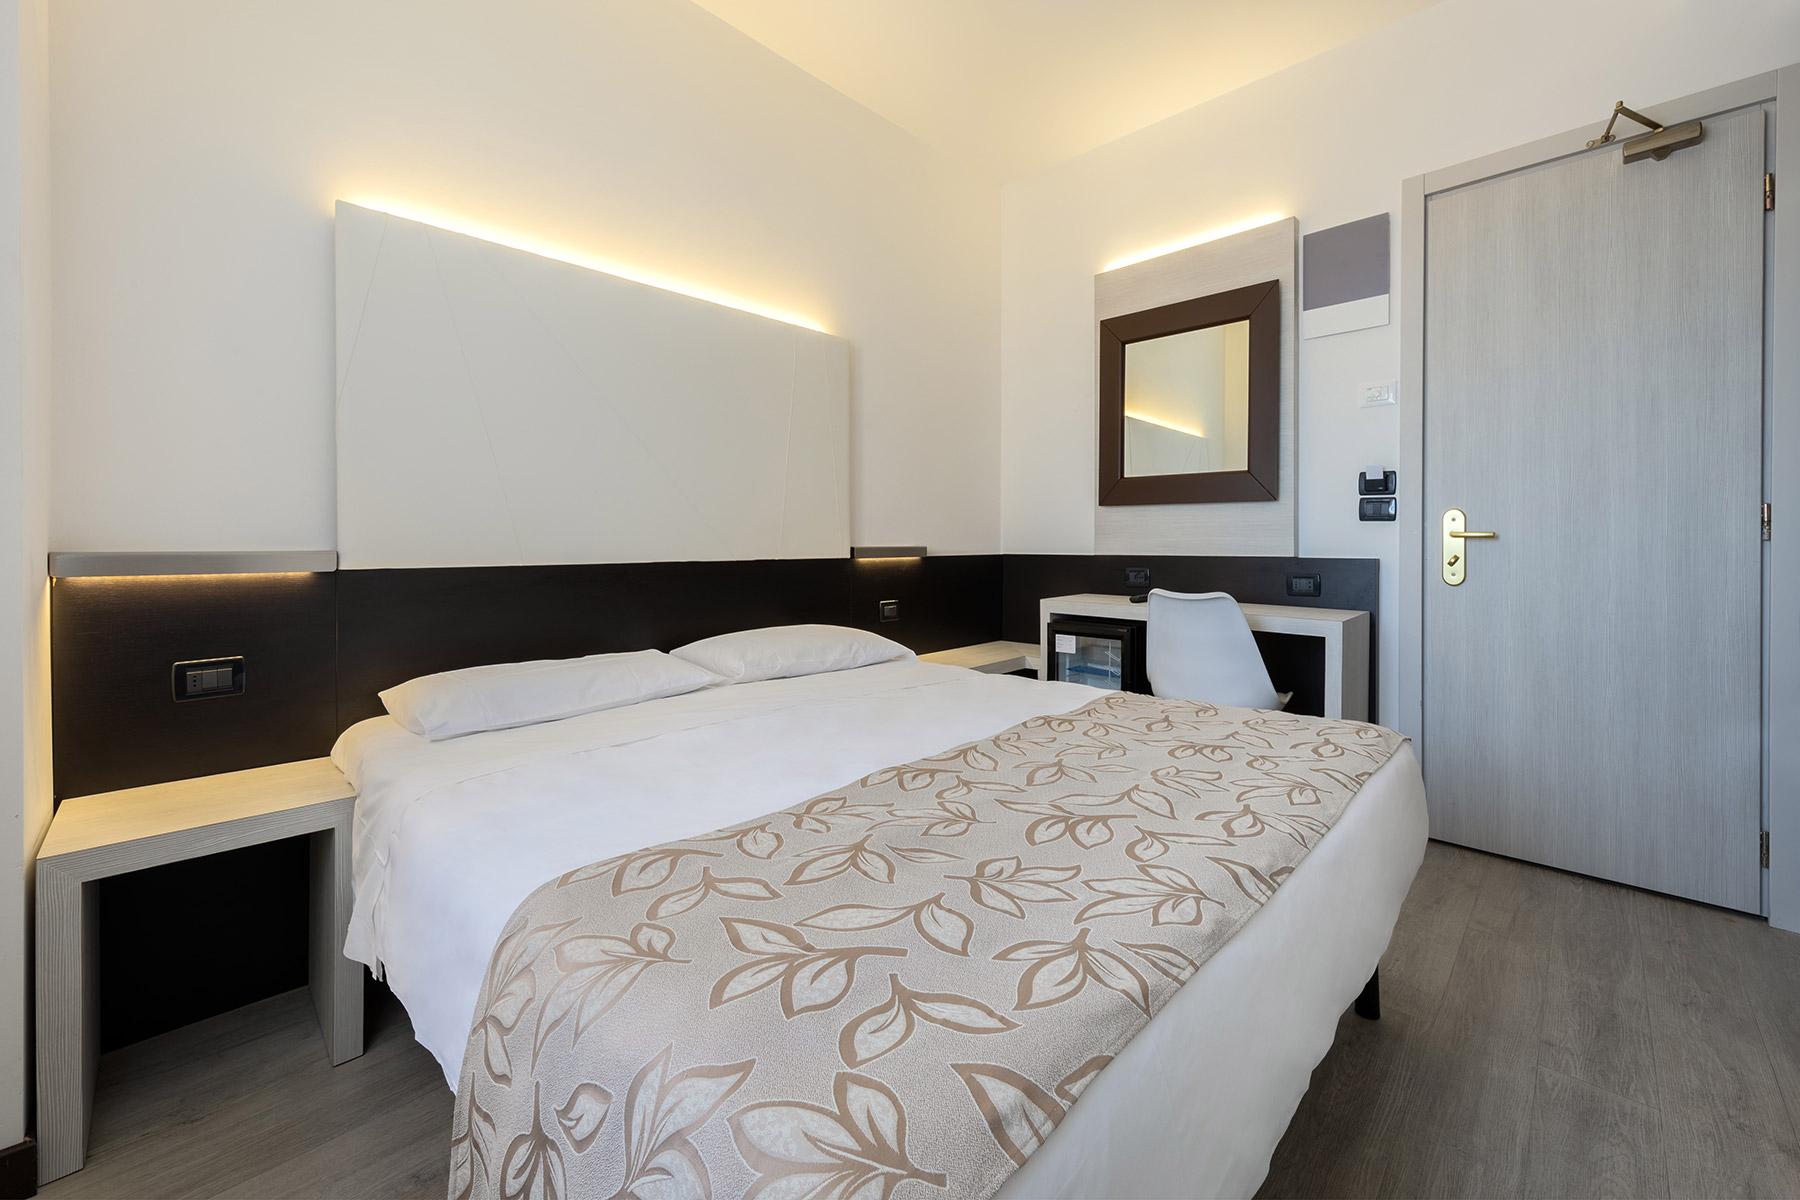 dbl-standard-ambasciatori-hotel